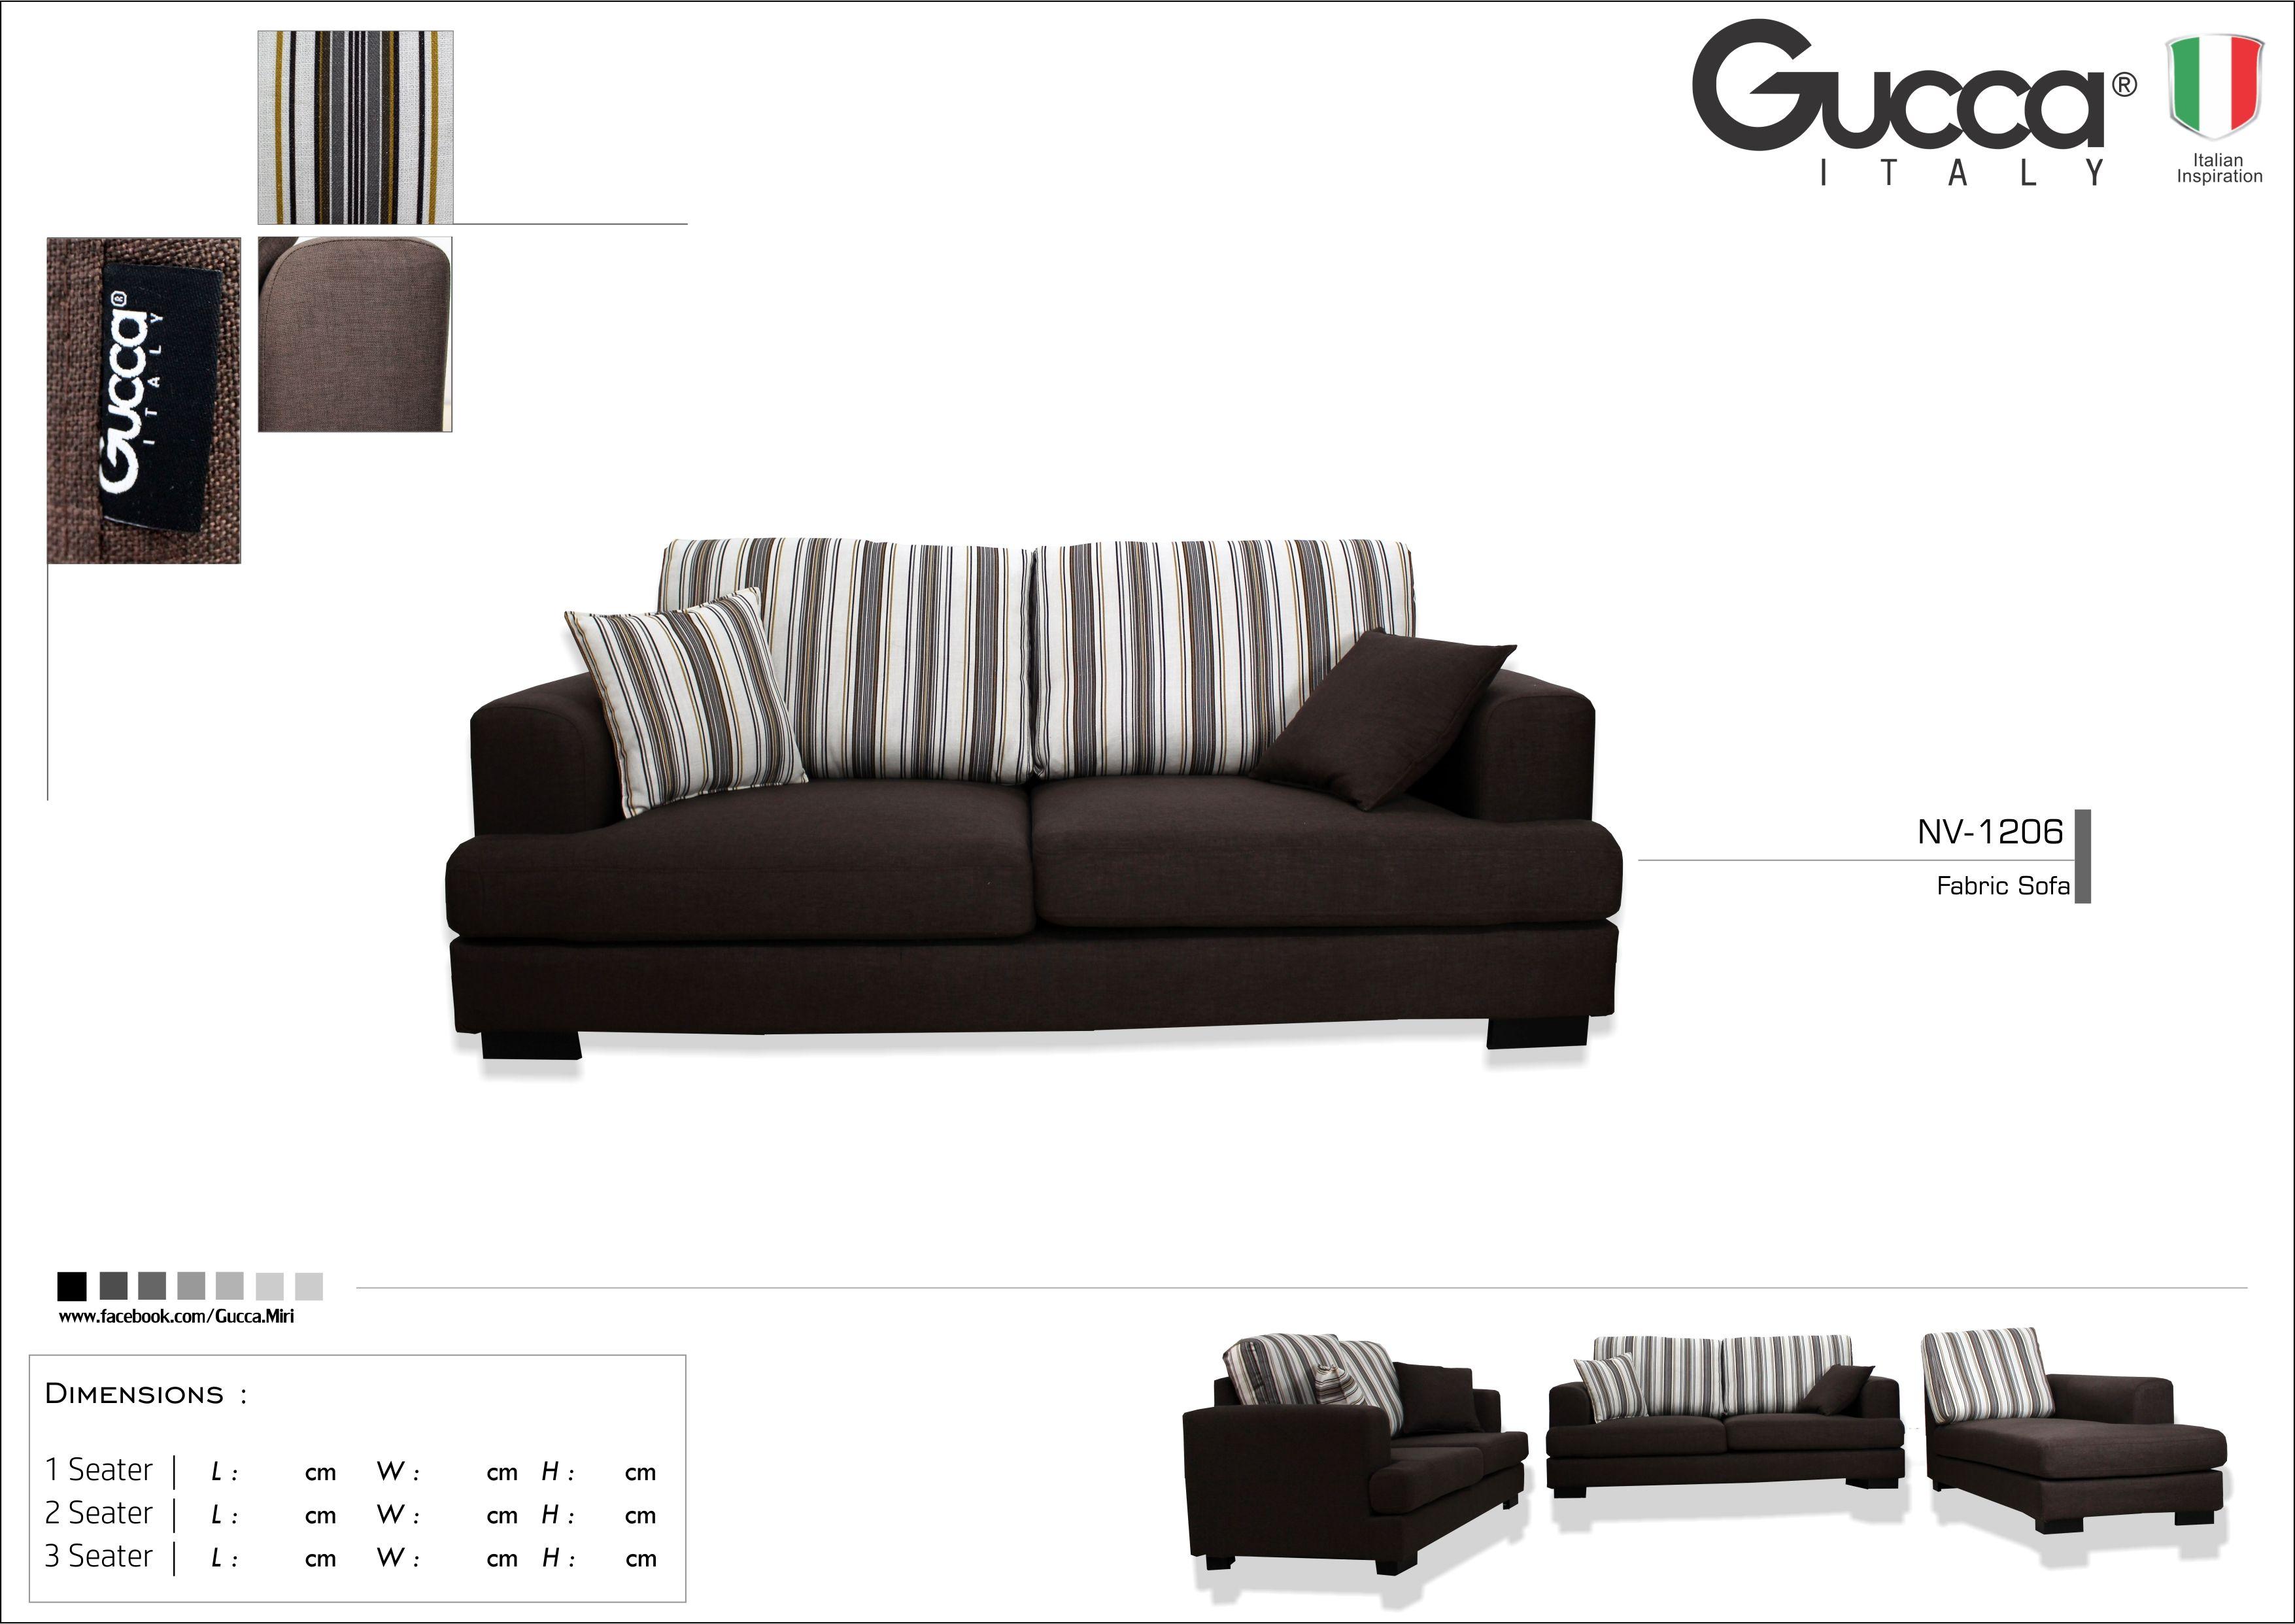 Fabric Sofa Gucca Italy Miri G Brothers Furniture Sdn Bhd